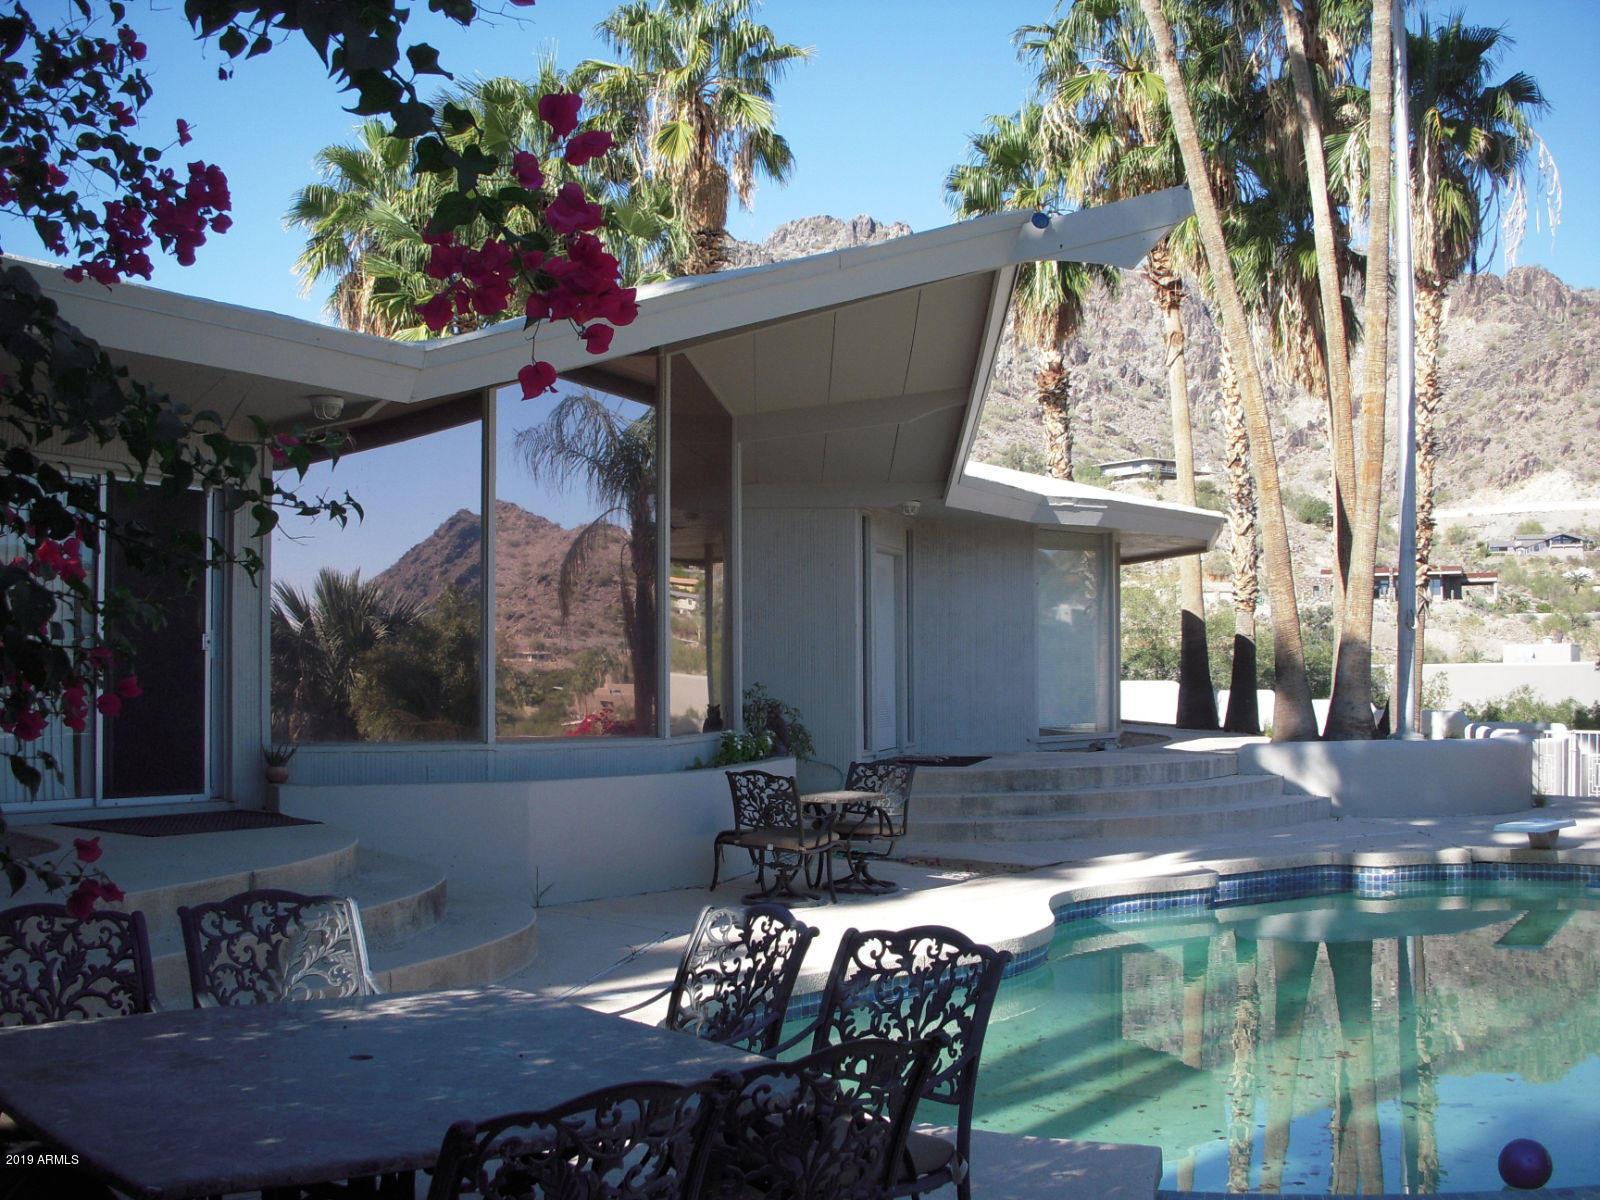 7202 N RED LEDGE Drive, Paradise Valley, Arizona